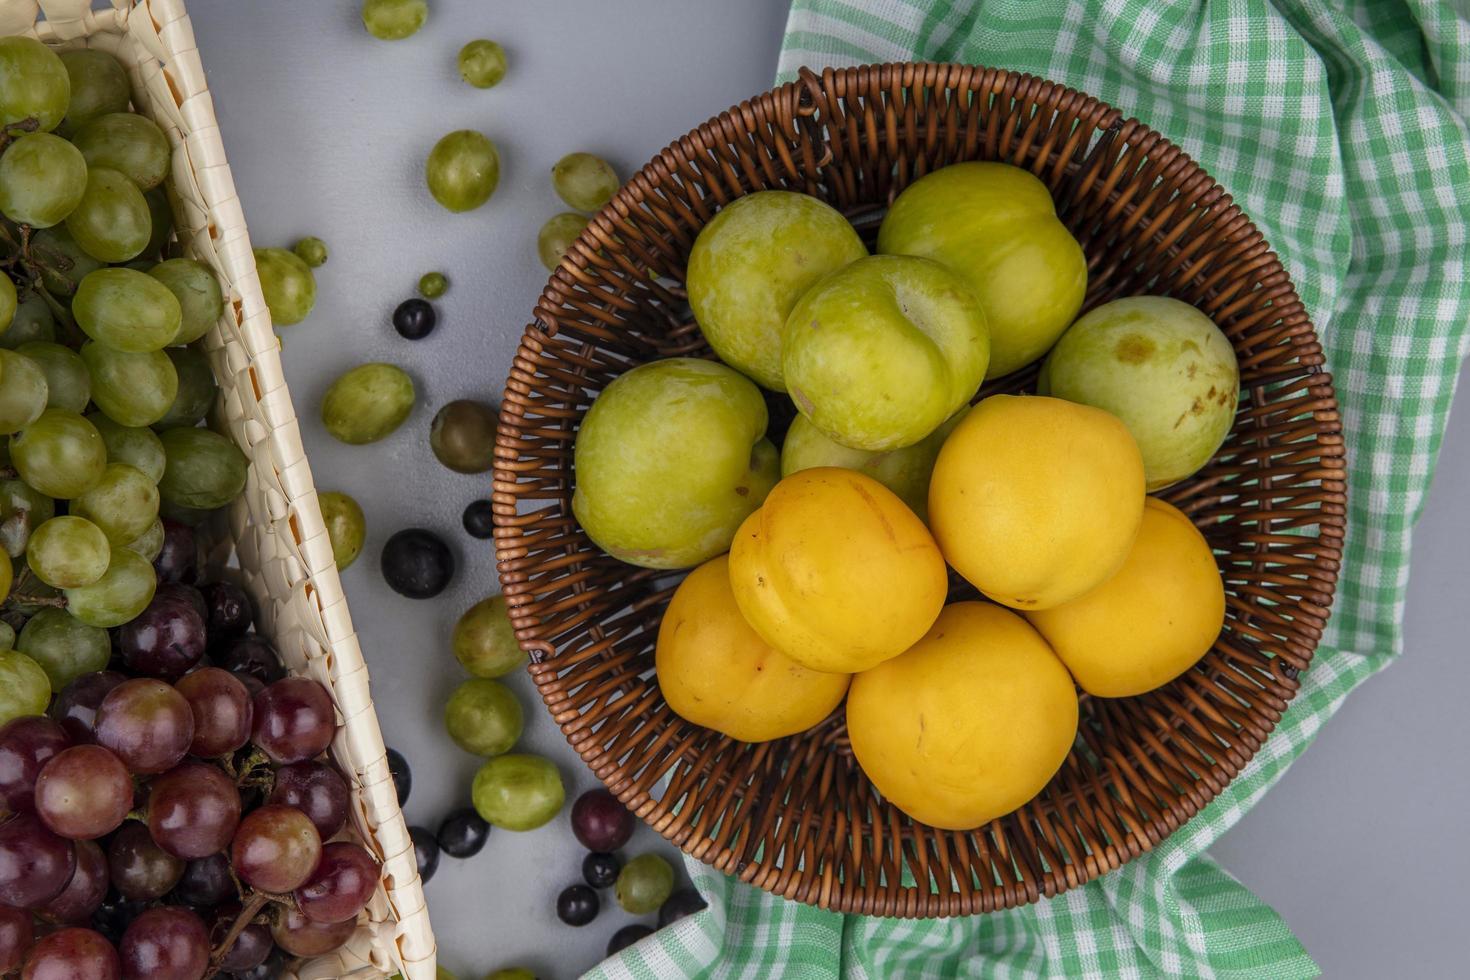 Vista superior de la fruta en una canasta sobre tela escocesa foto